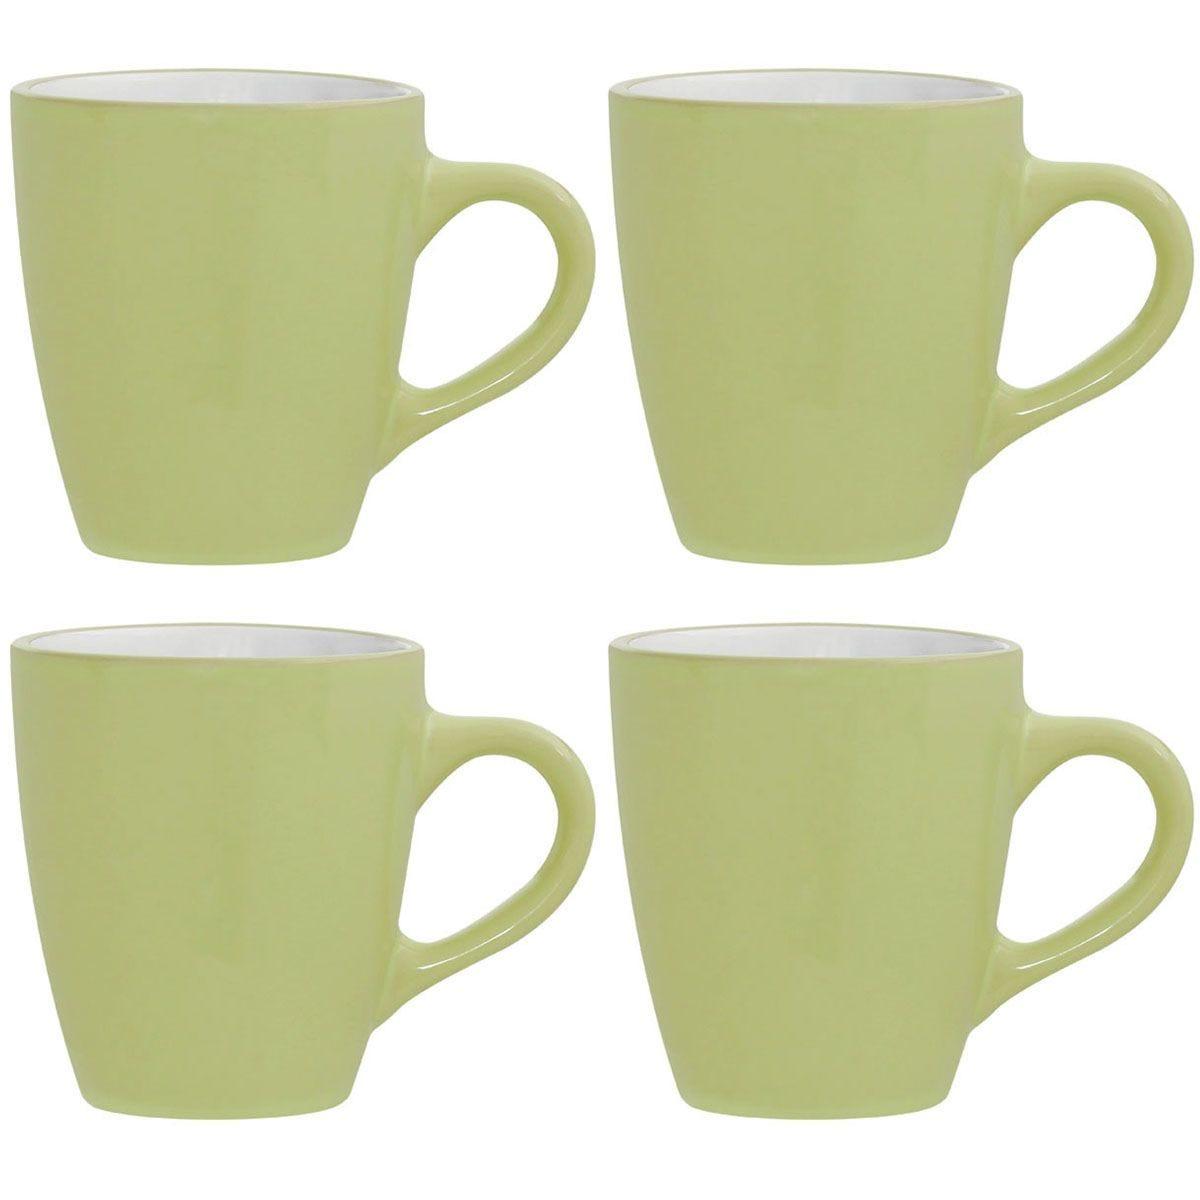 Premier Housewares Green Sienna Mugs - Set of 4